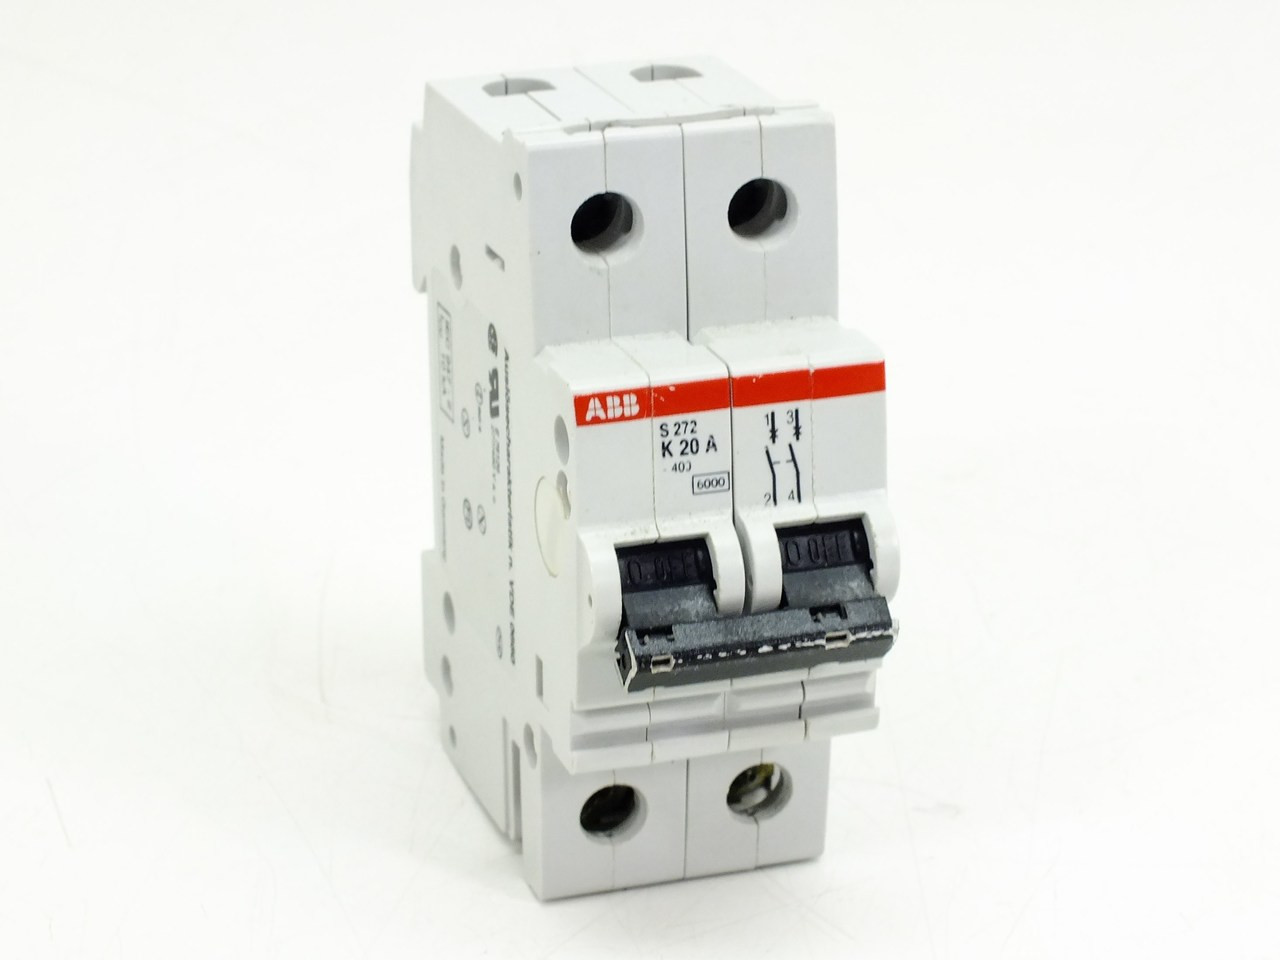 Abb S272 K20a Circuit Breaker 20amp 2pole 277 480vac